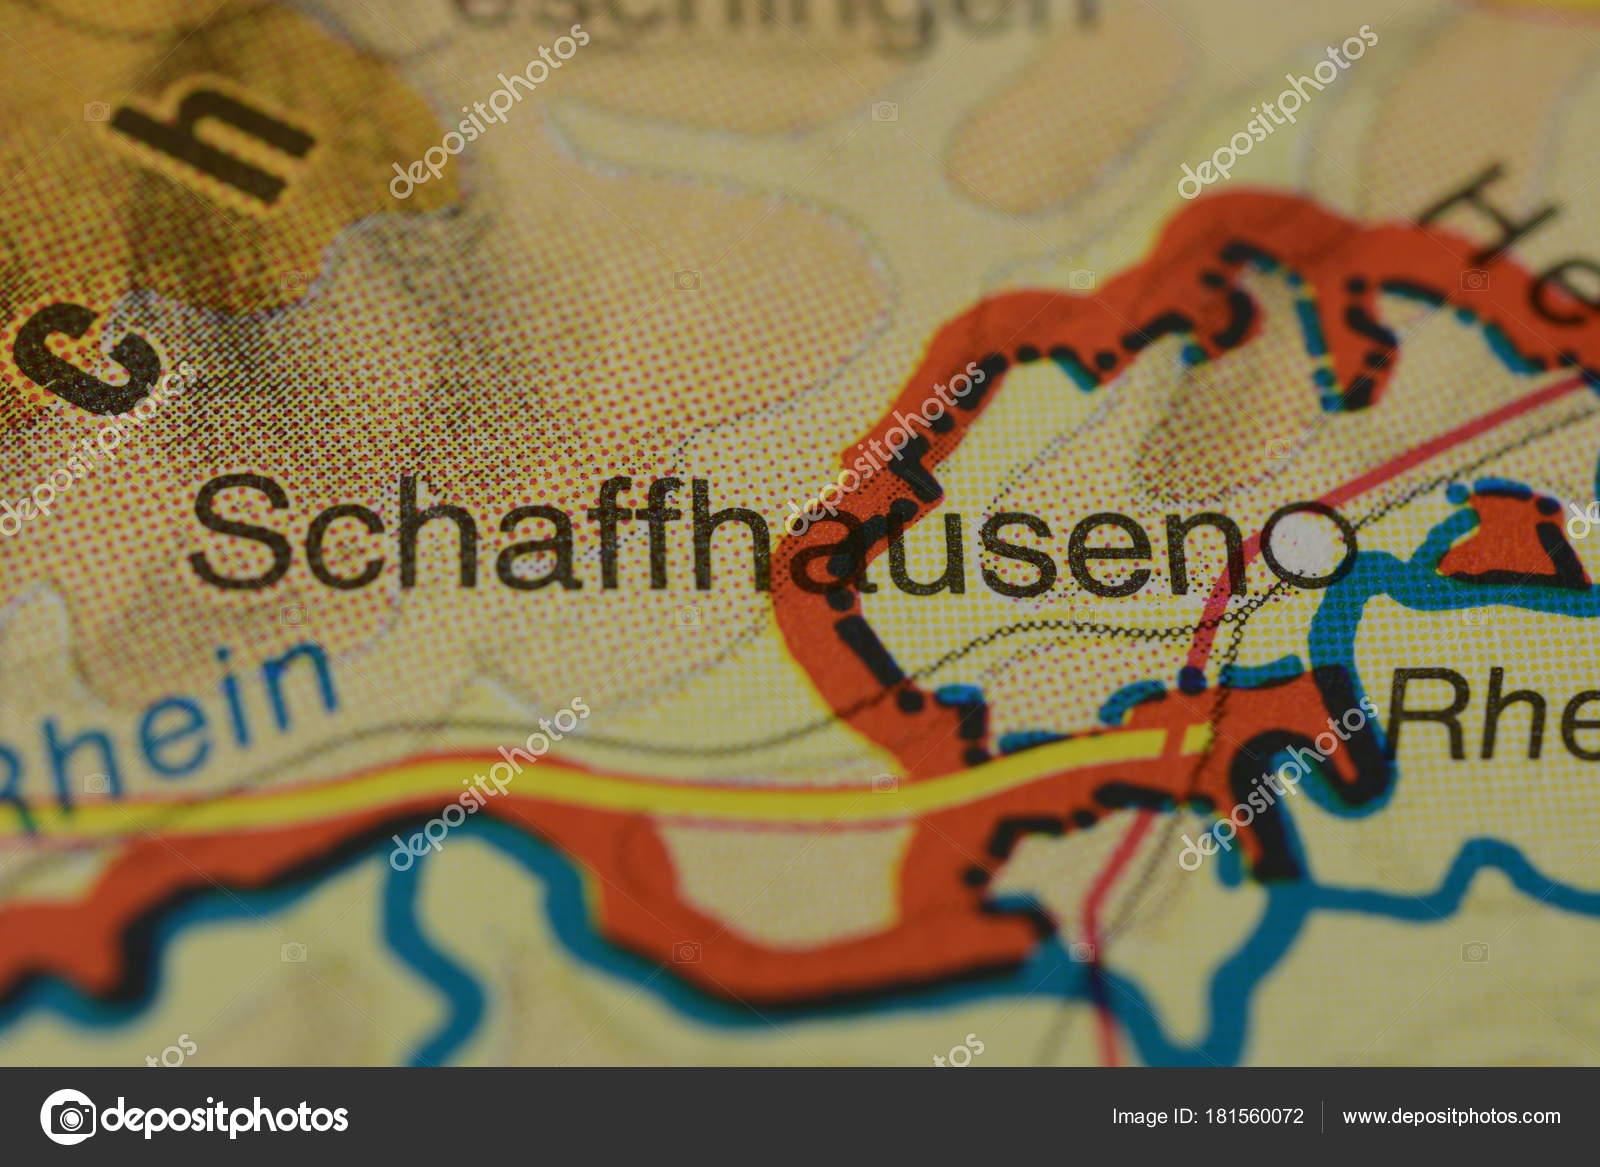 City Name Schaffhausen Switzerland Map Stock Photo photographer